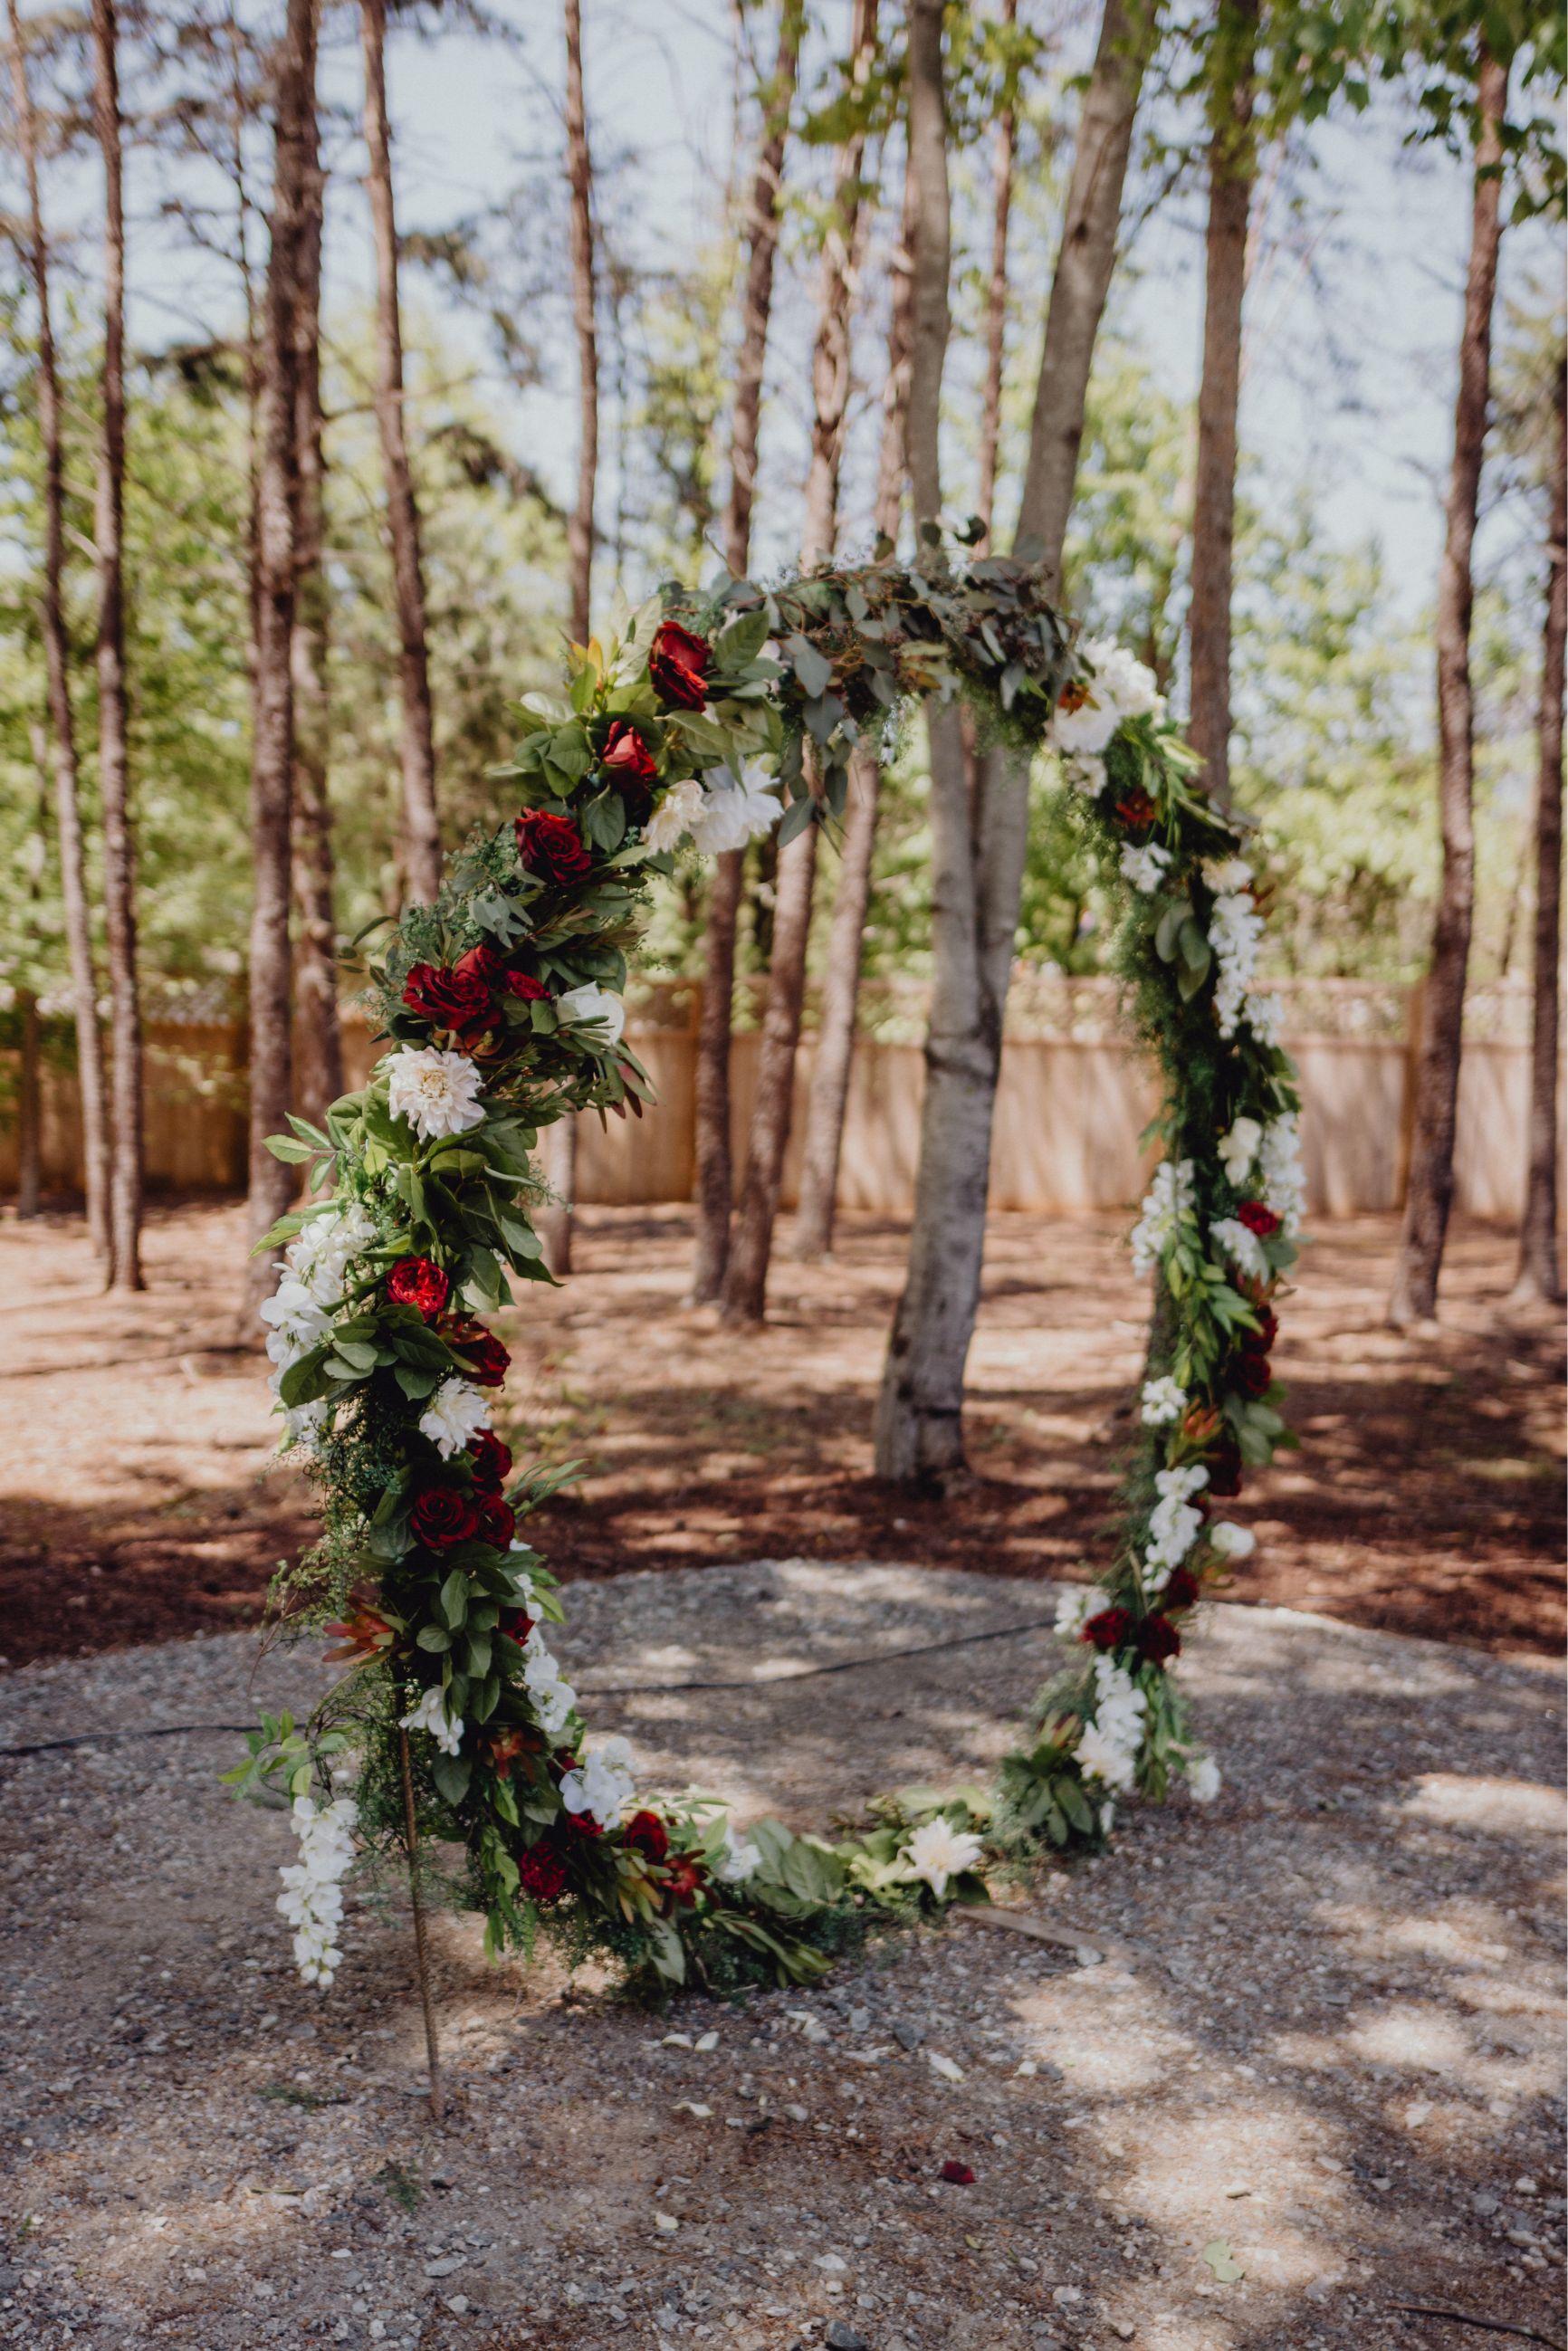 North-Dallas-Wedding-Florist-David-Co.-21.jpg